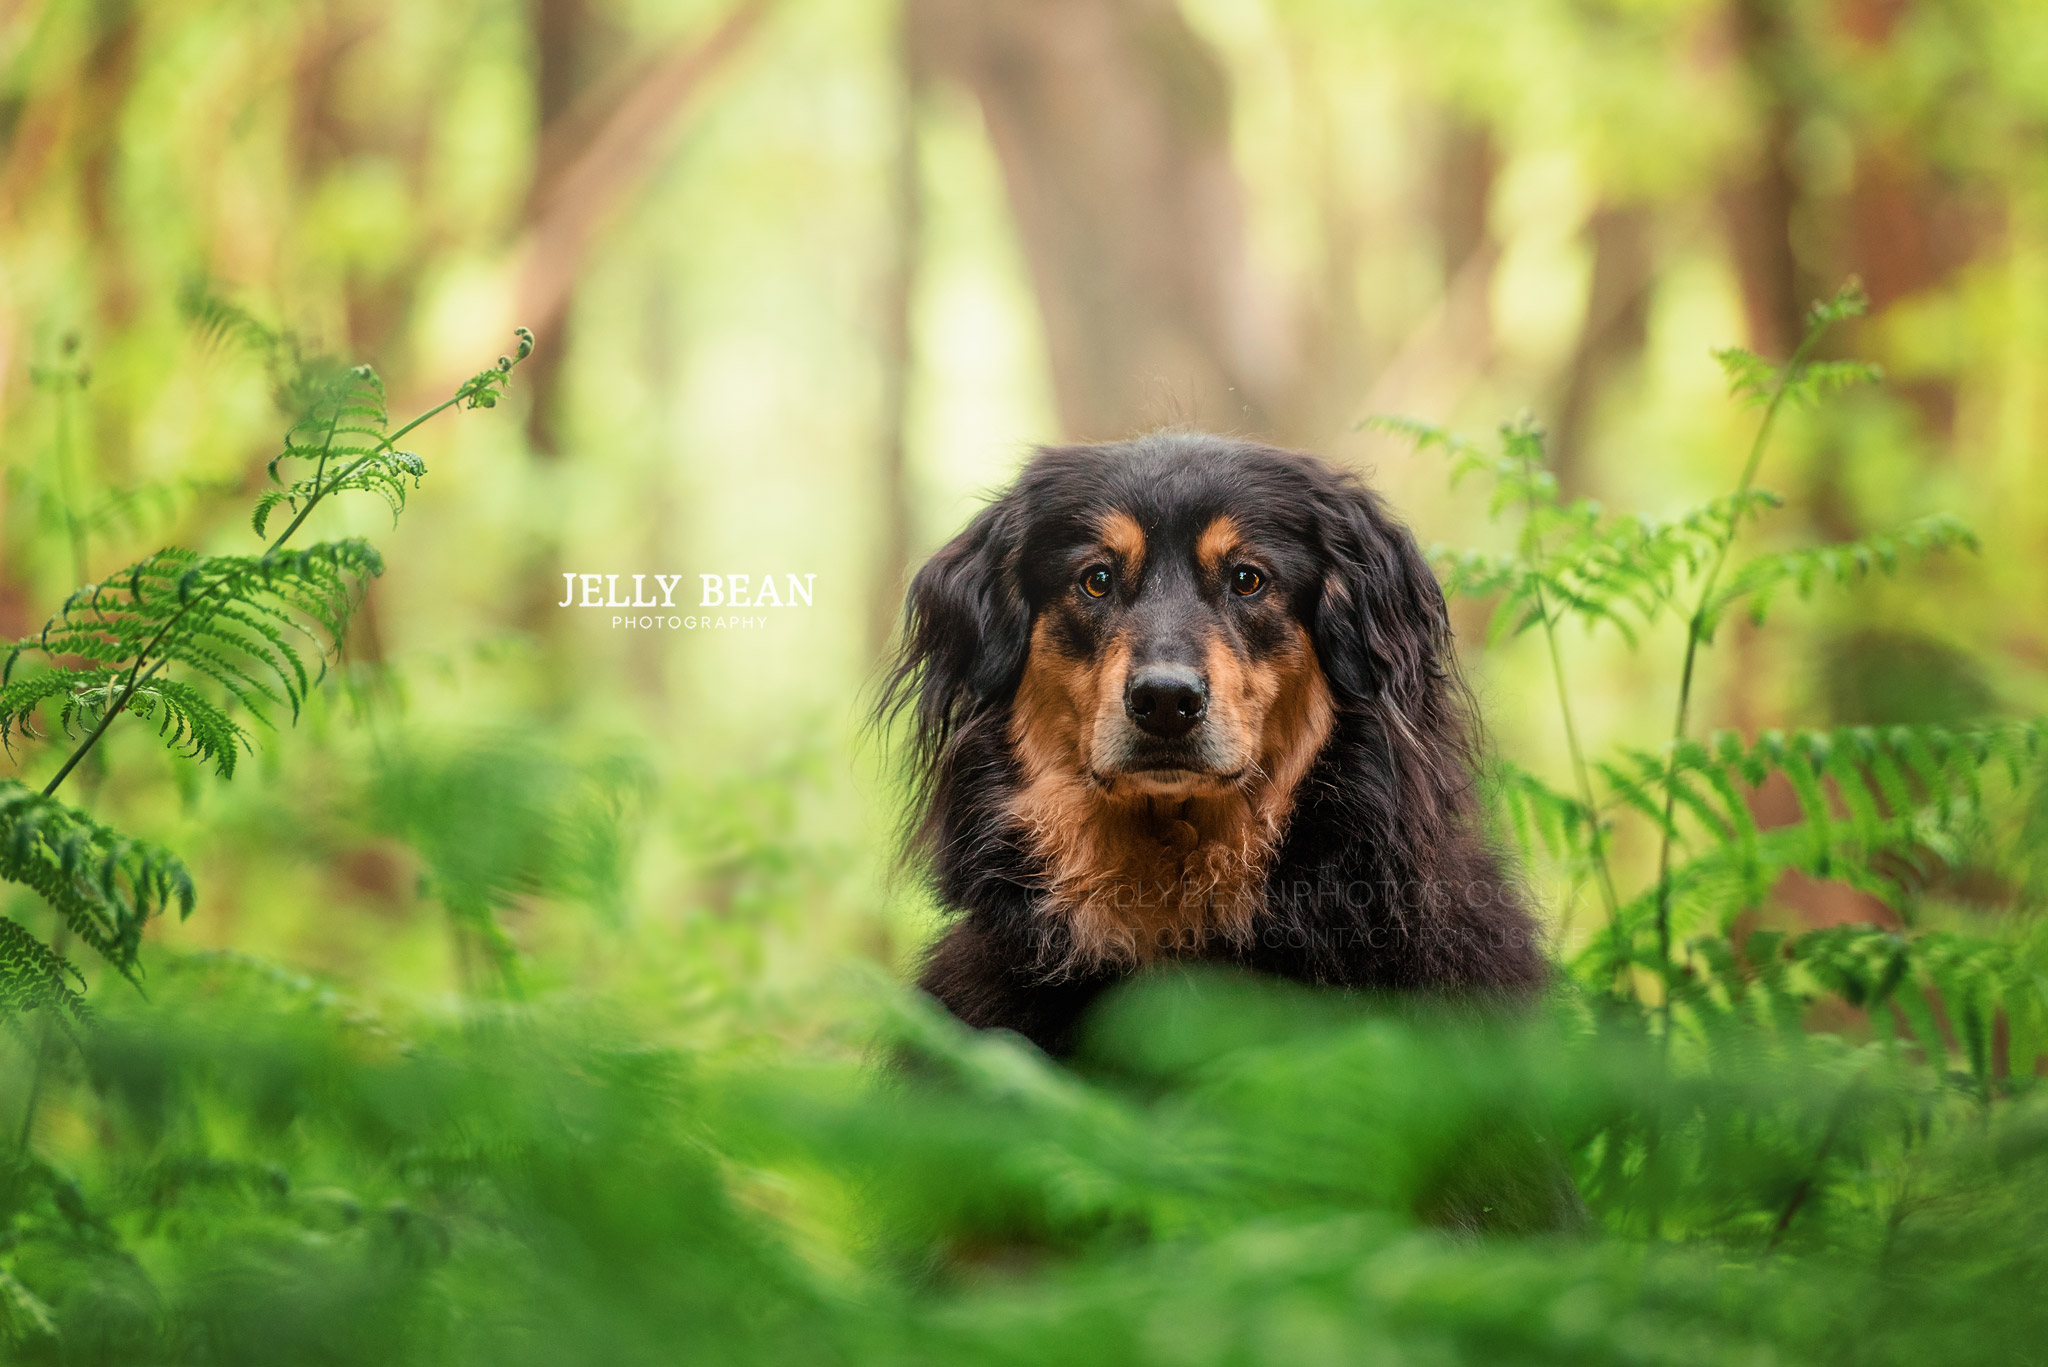 English Shepherd Dog portrait